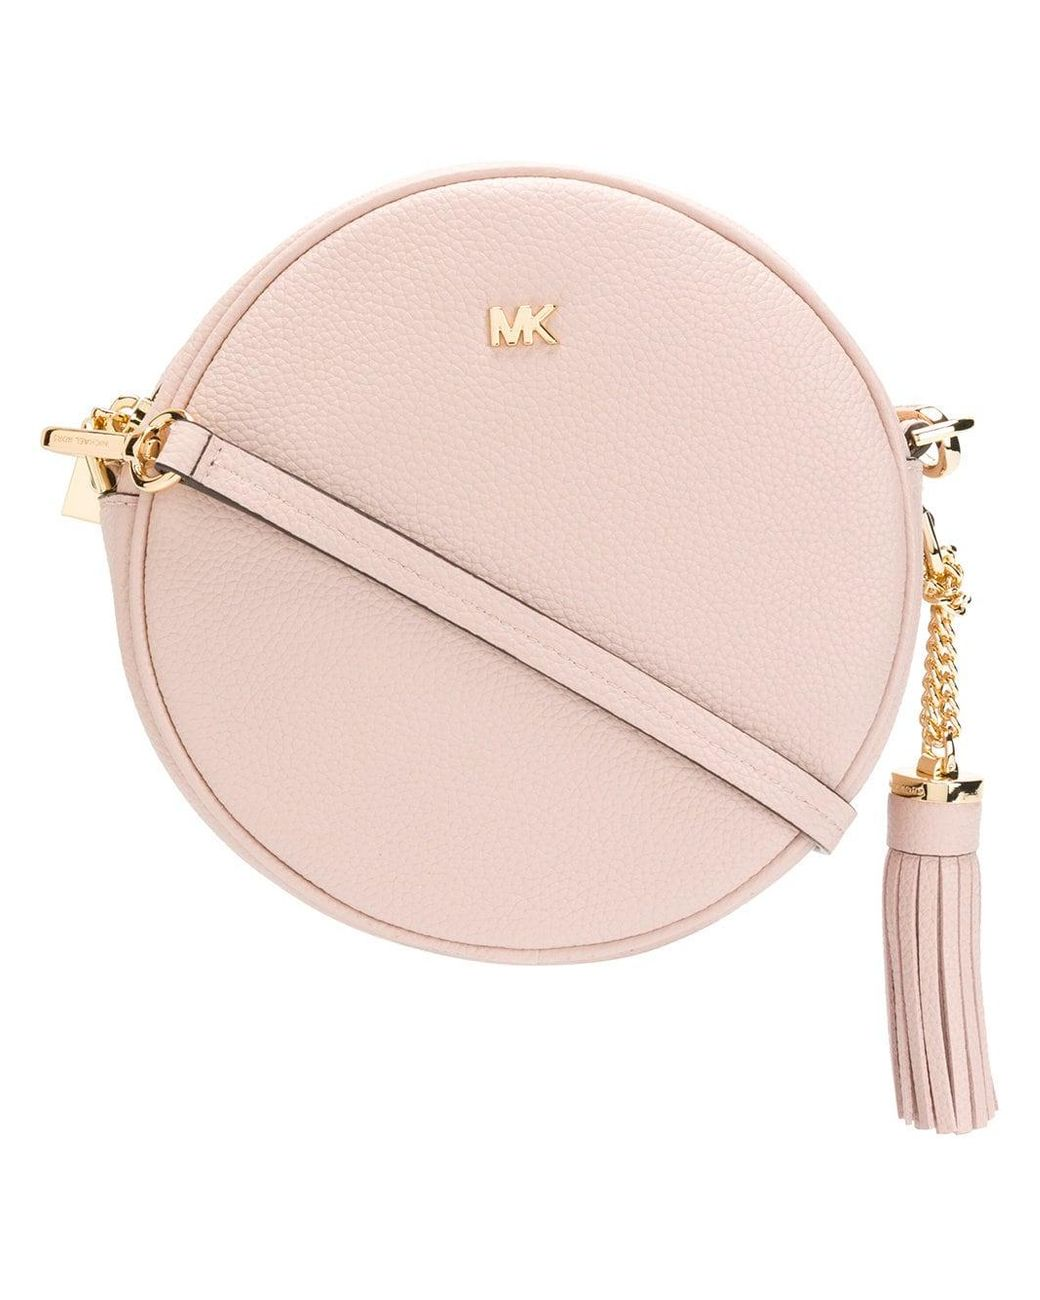 4f6c7b0c1e1b MICHAEL Michael Kors Mercer Medium Cross-body Bag in Pink - Save 5 ...